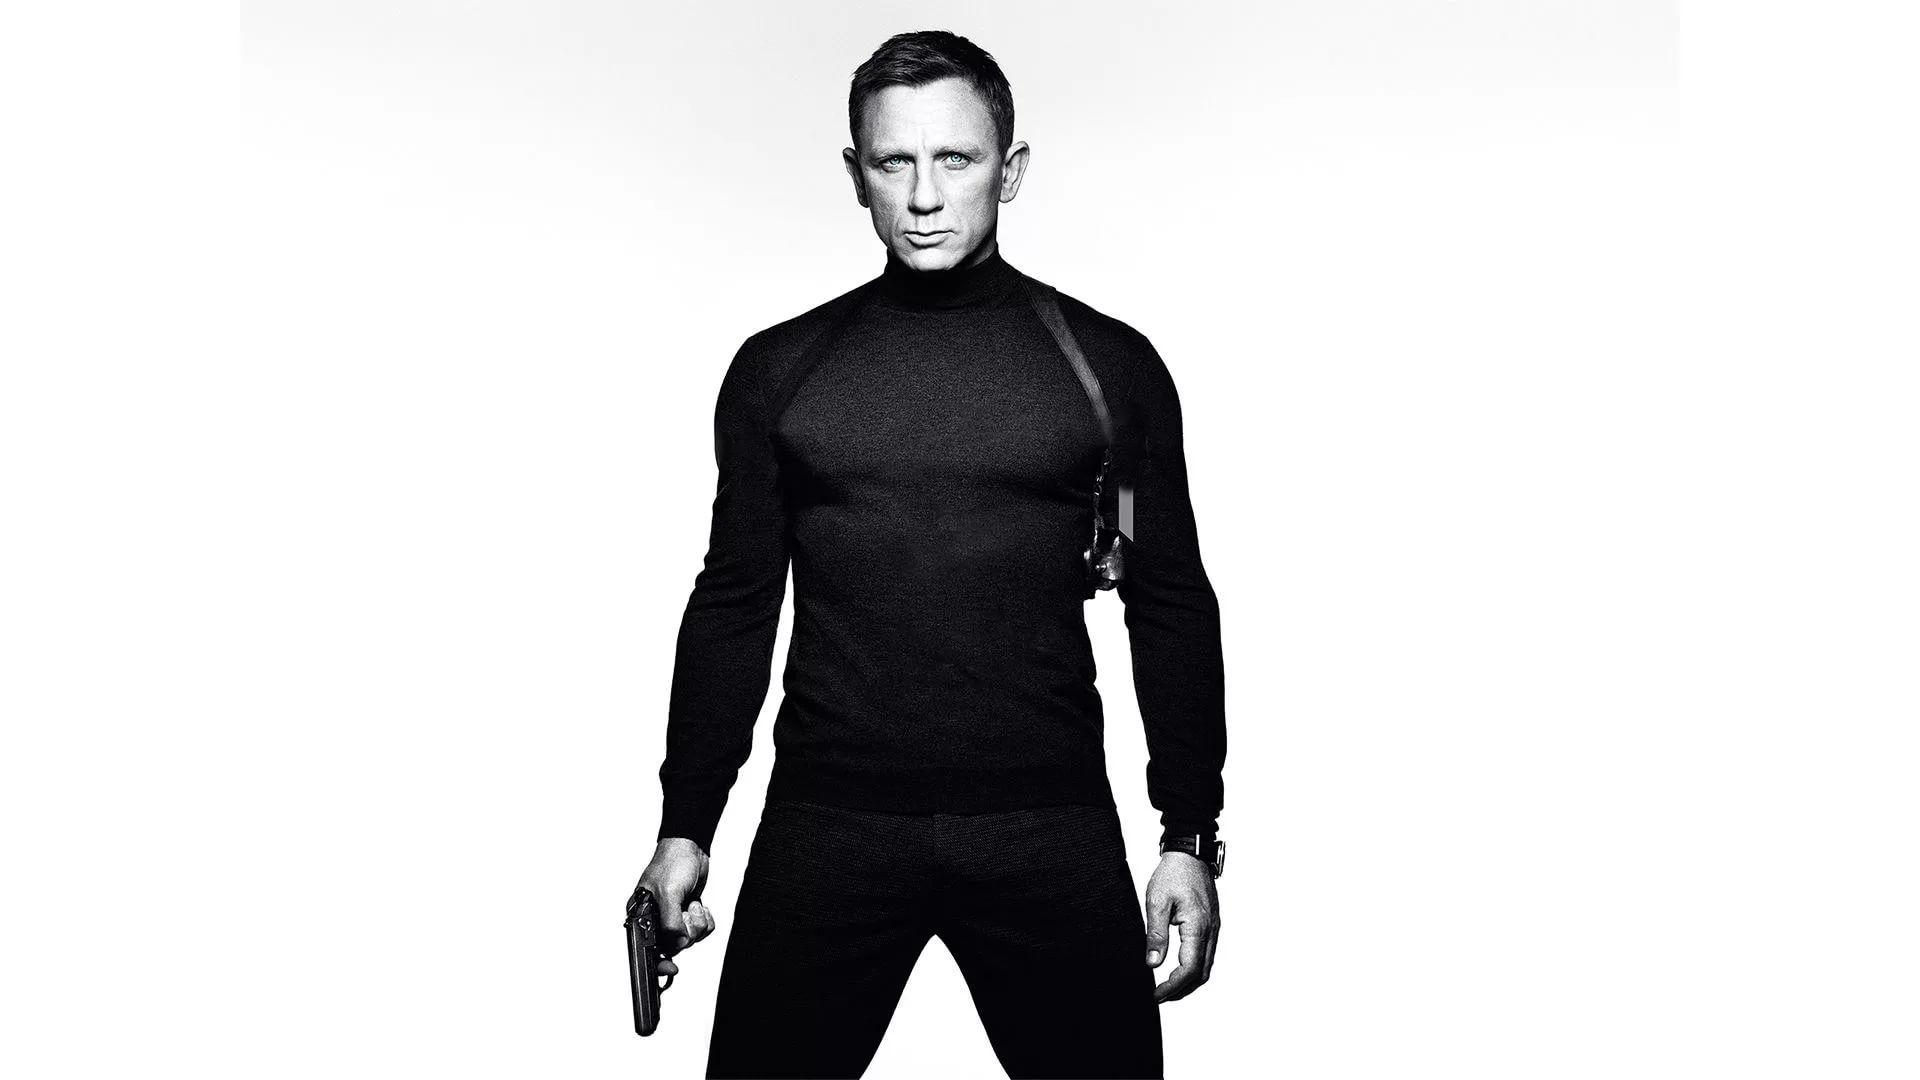 James Bond beautiful wallpaper